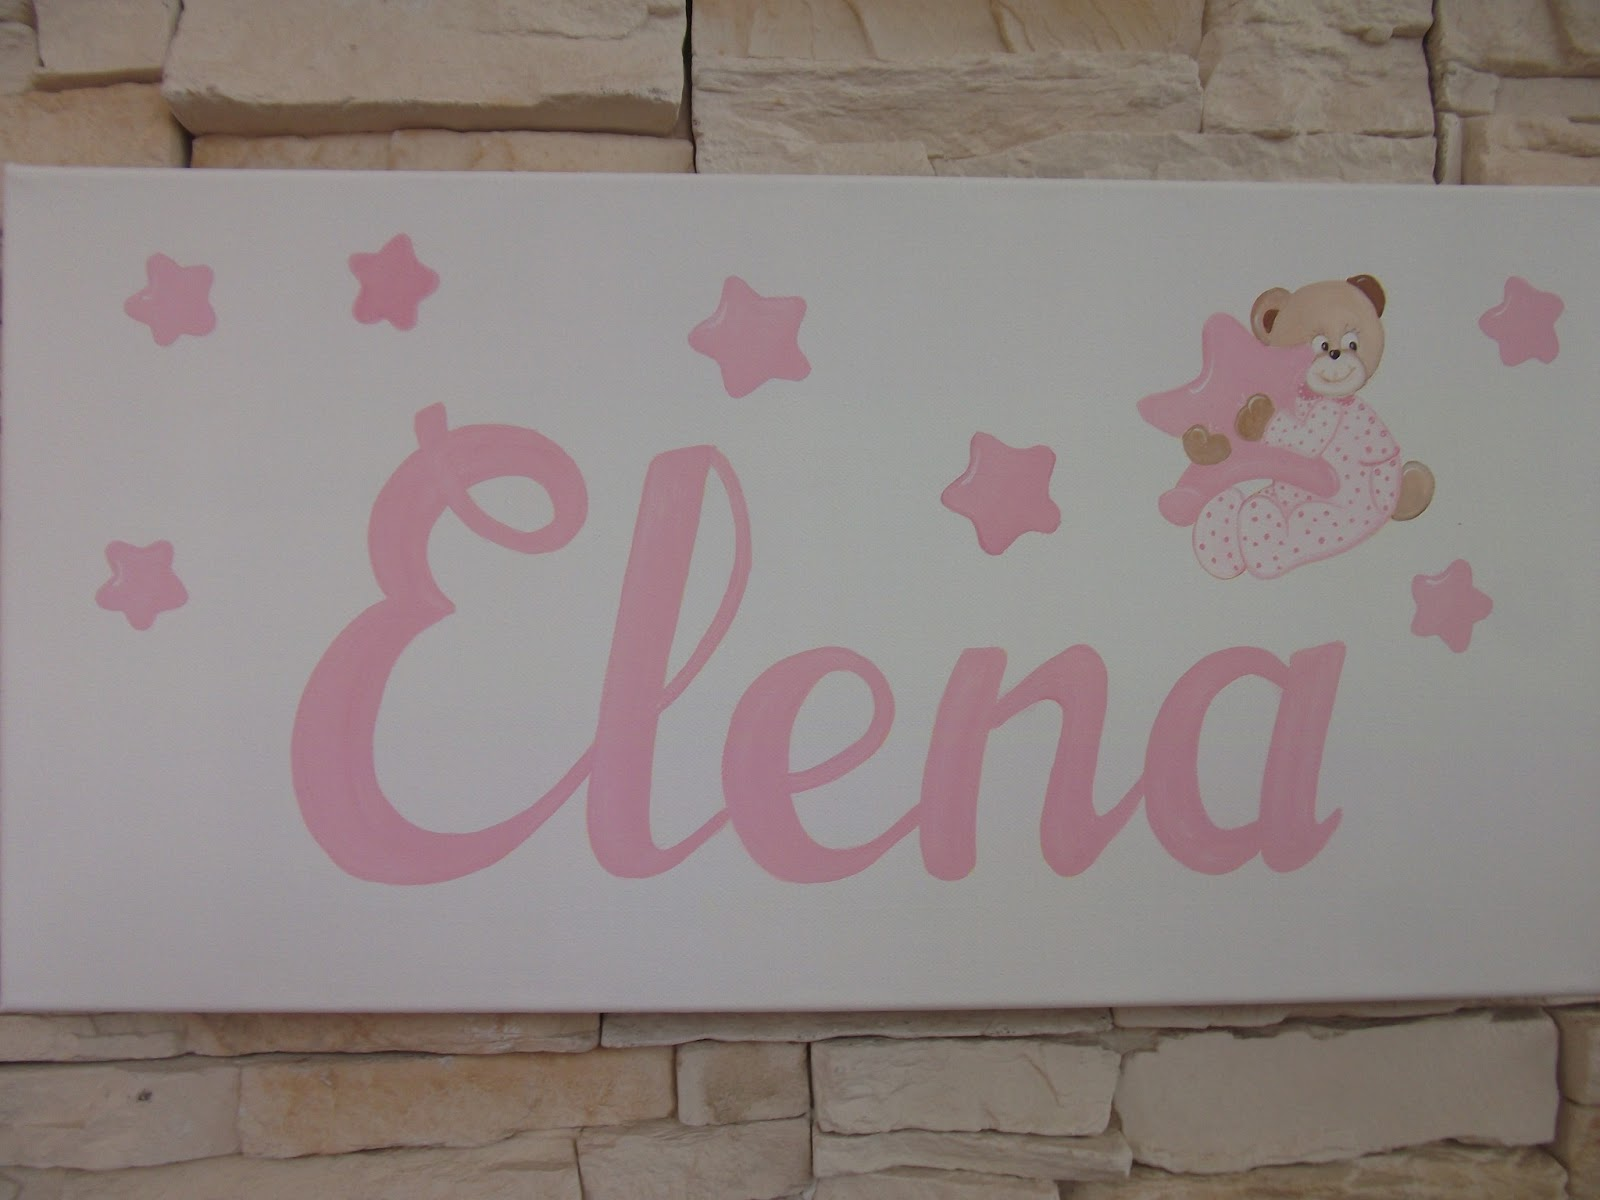 Decoraci n infantil pekerines osita con estrellas - Estrellas decoracion infantil ...